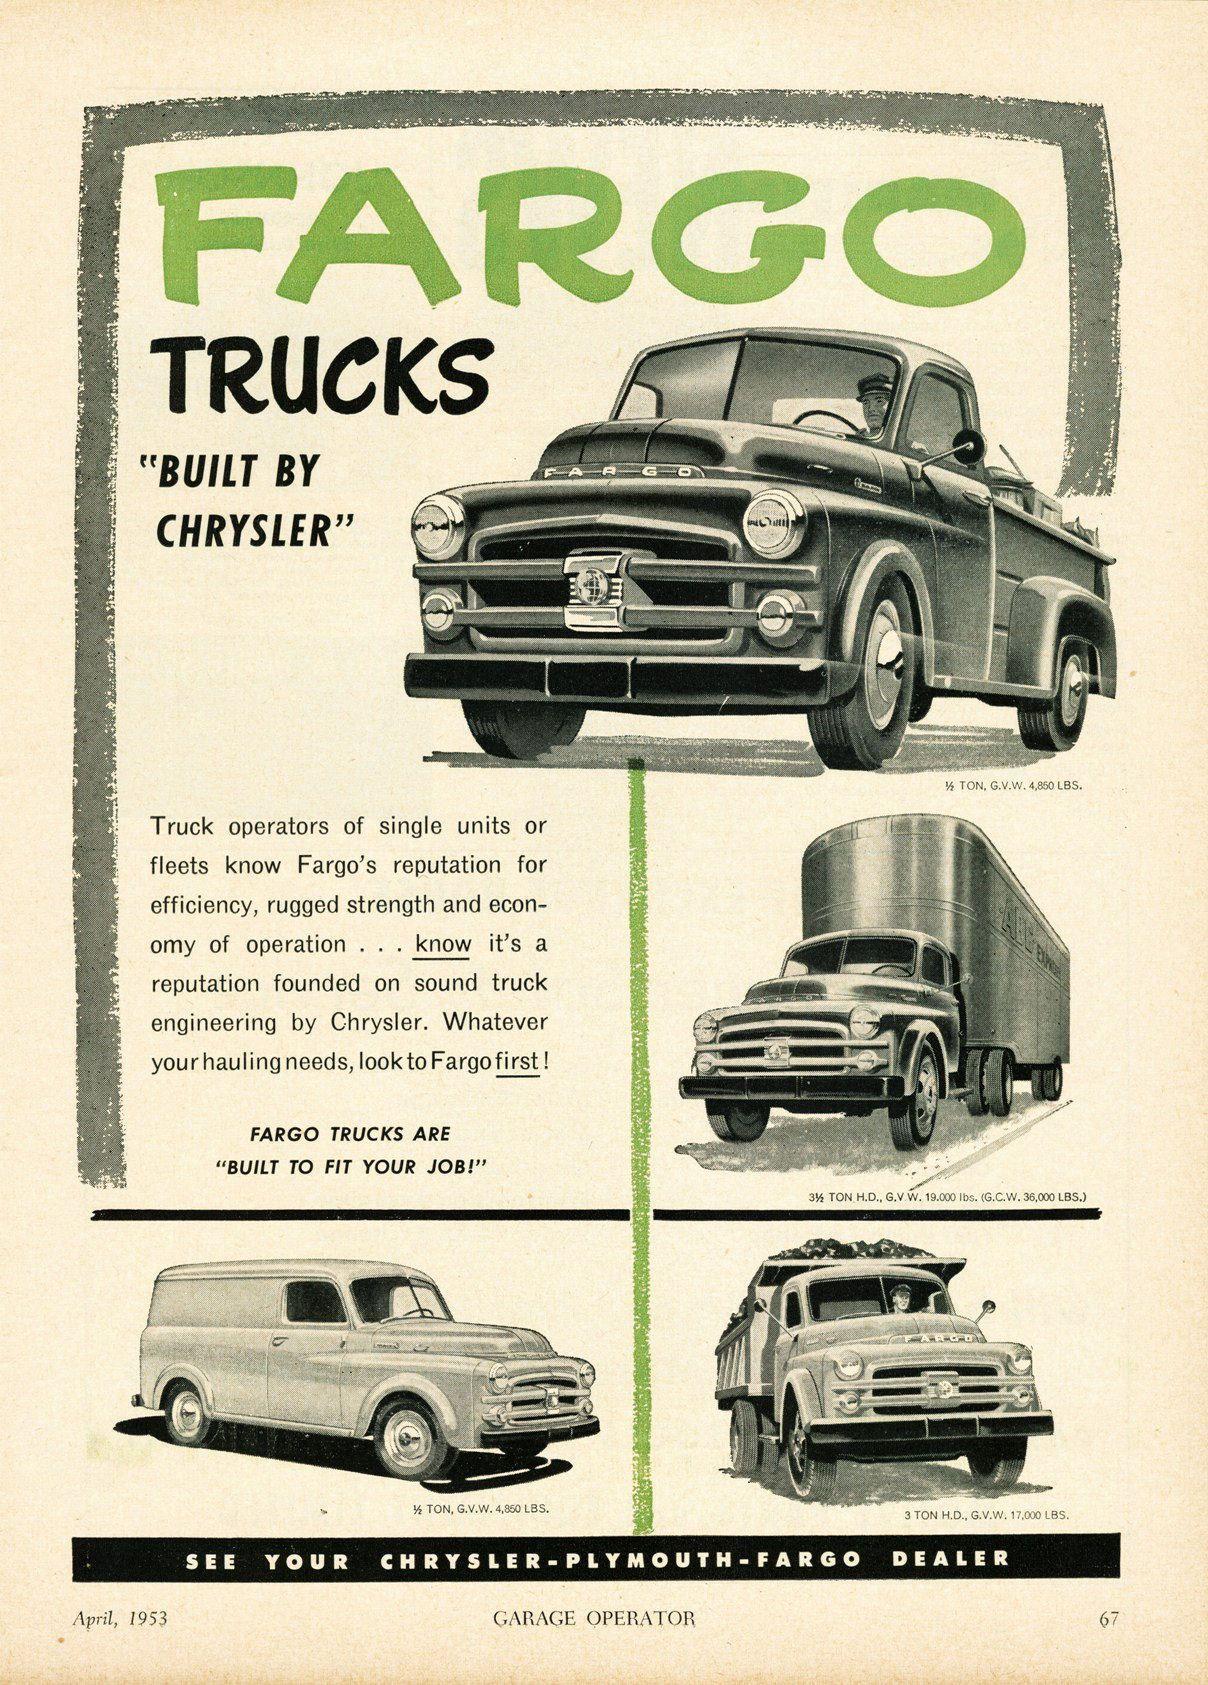 1953 Fargo Truck Ad-01 | Ideas 4 \'52 Dodge Pilot House | Pinterest ...